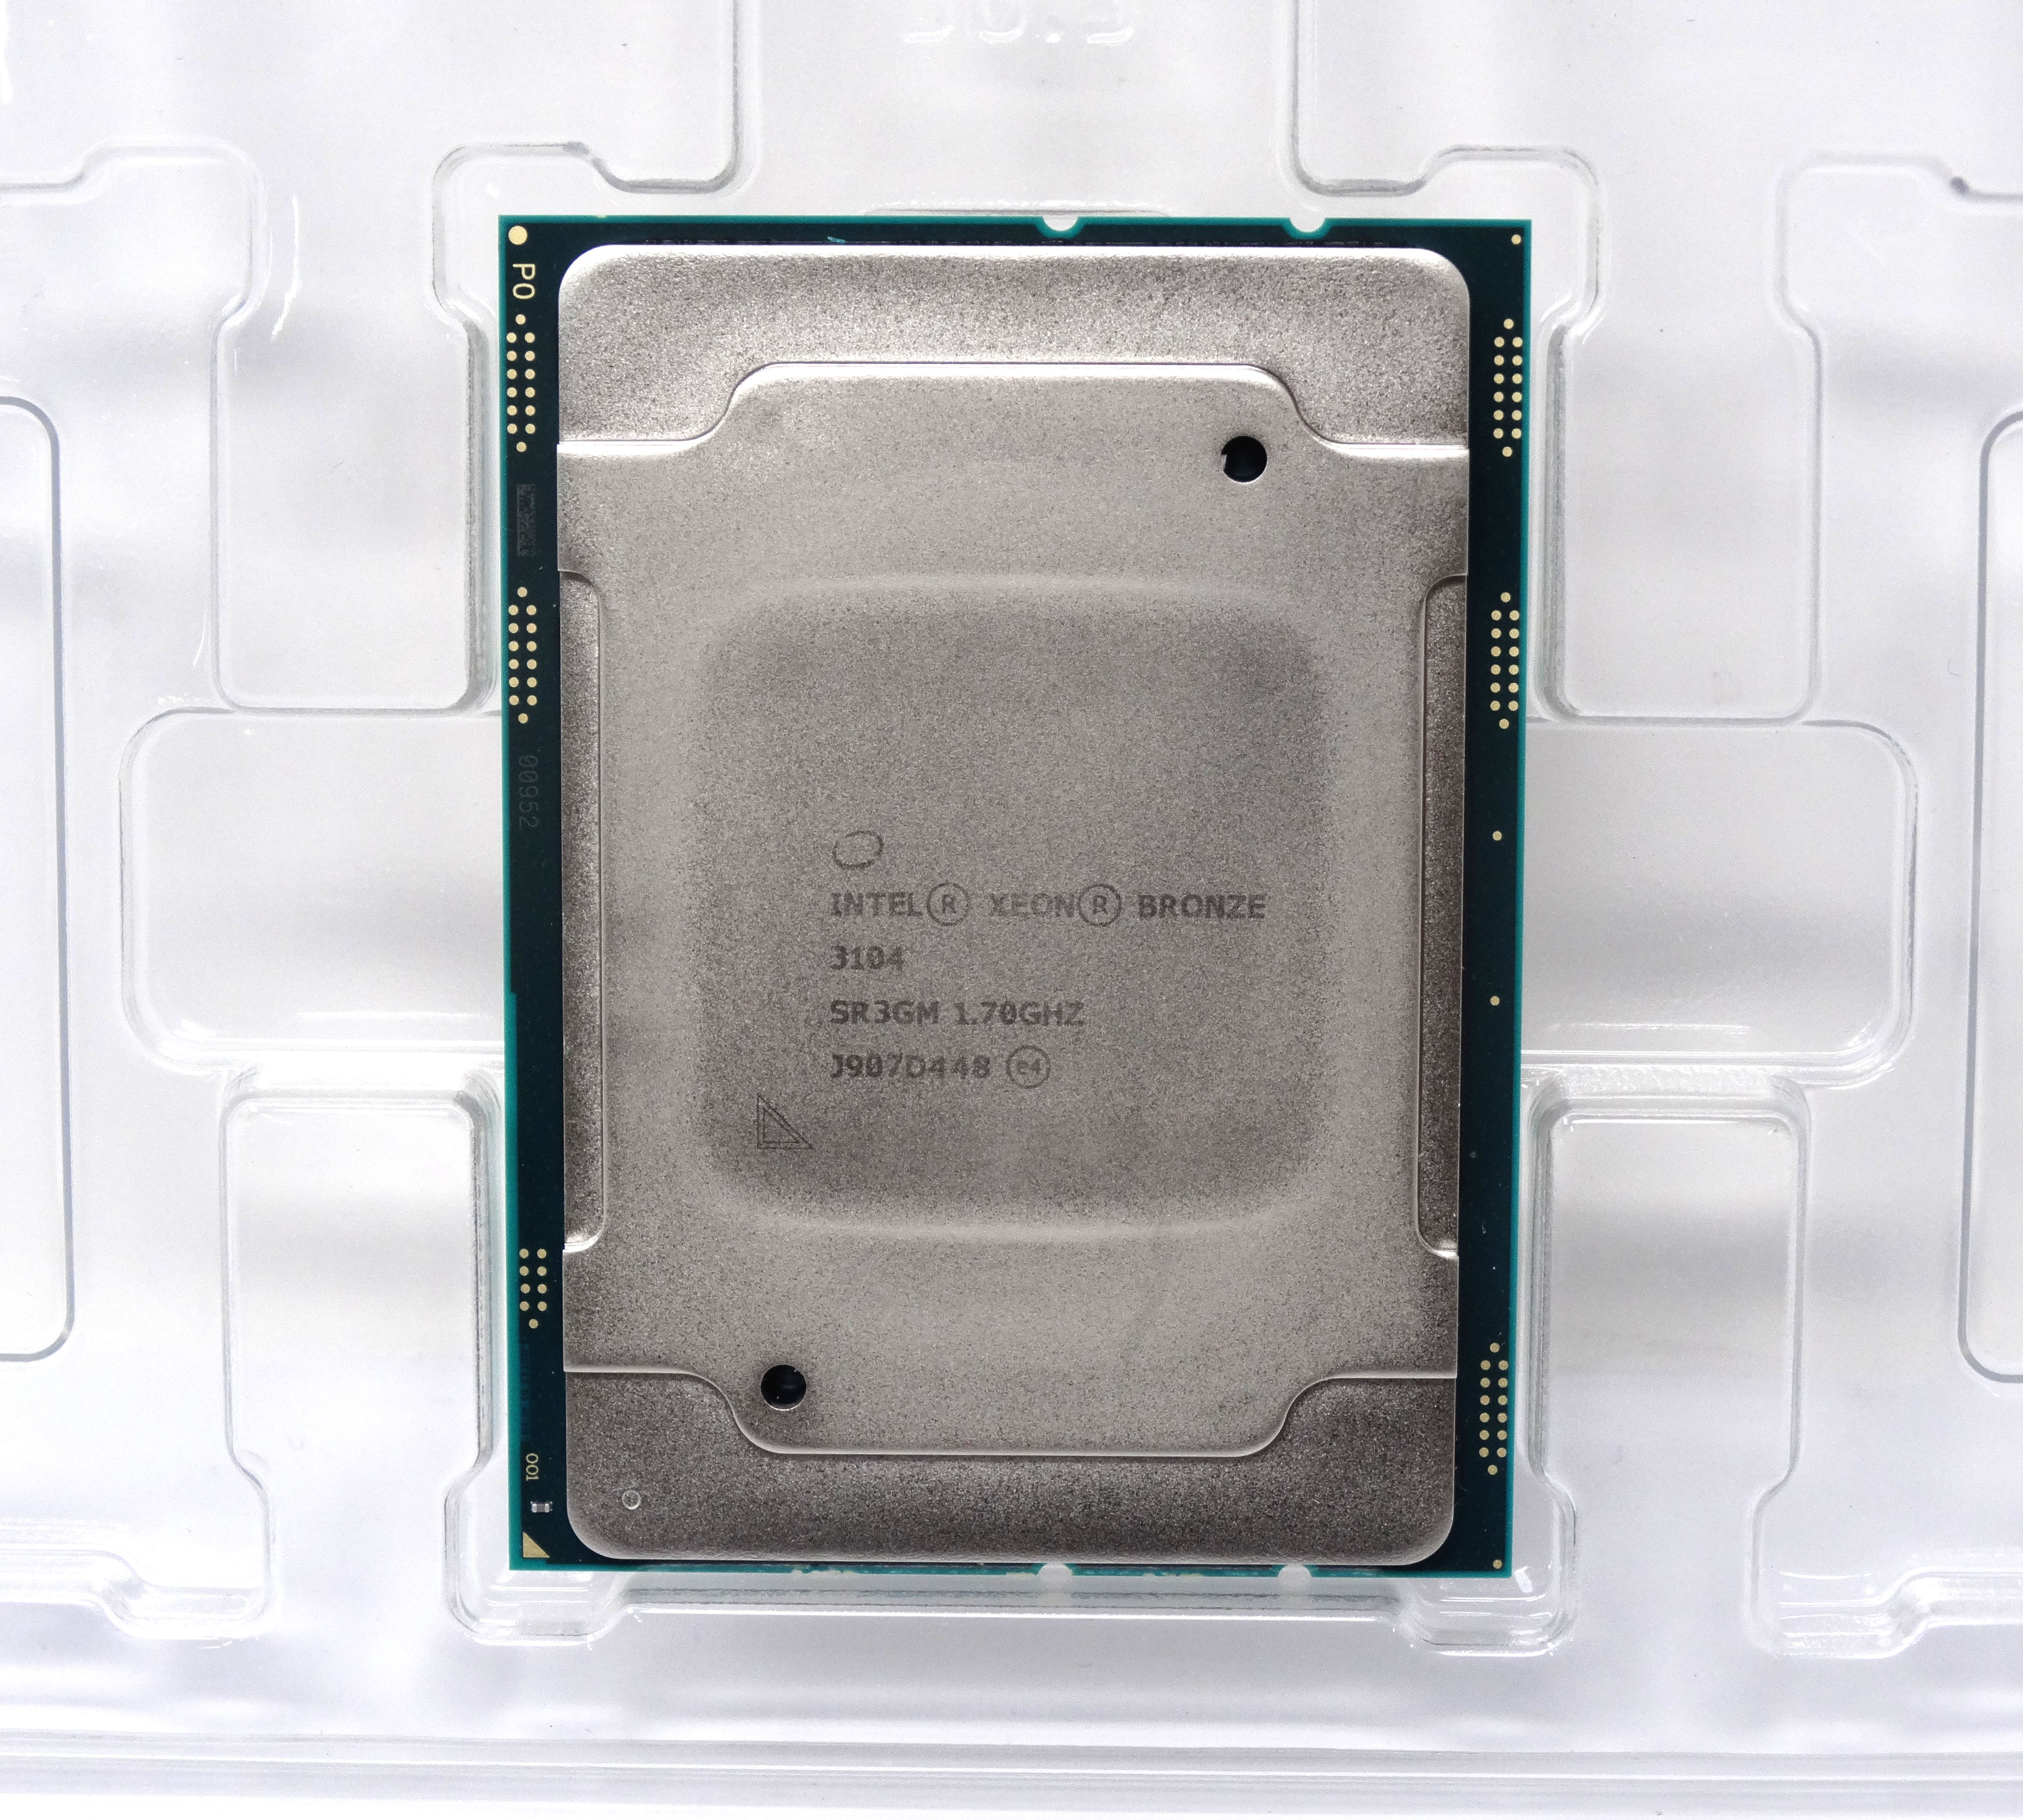 - CPU Only Intel Xeon Bronze 3104 6 Cores 1.7GHz 8.25MB CPU LGA 3647 Processor (P01880-B21 - CPU ONLY)